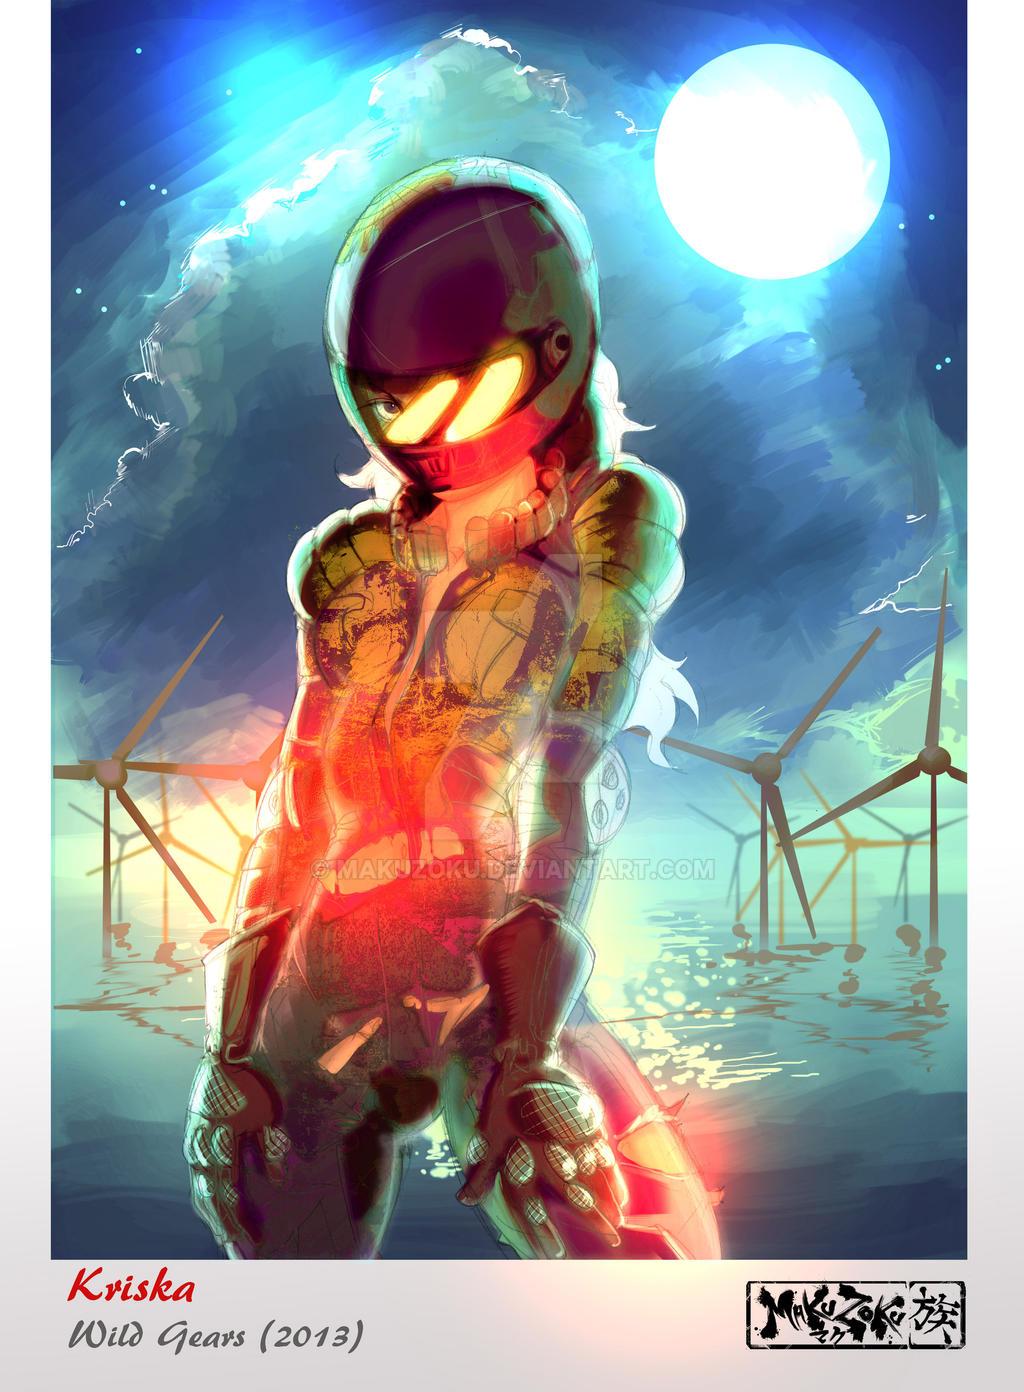 Kriska Bike suit v2 by MaKuZoKu